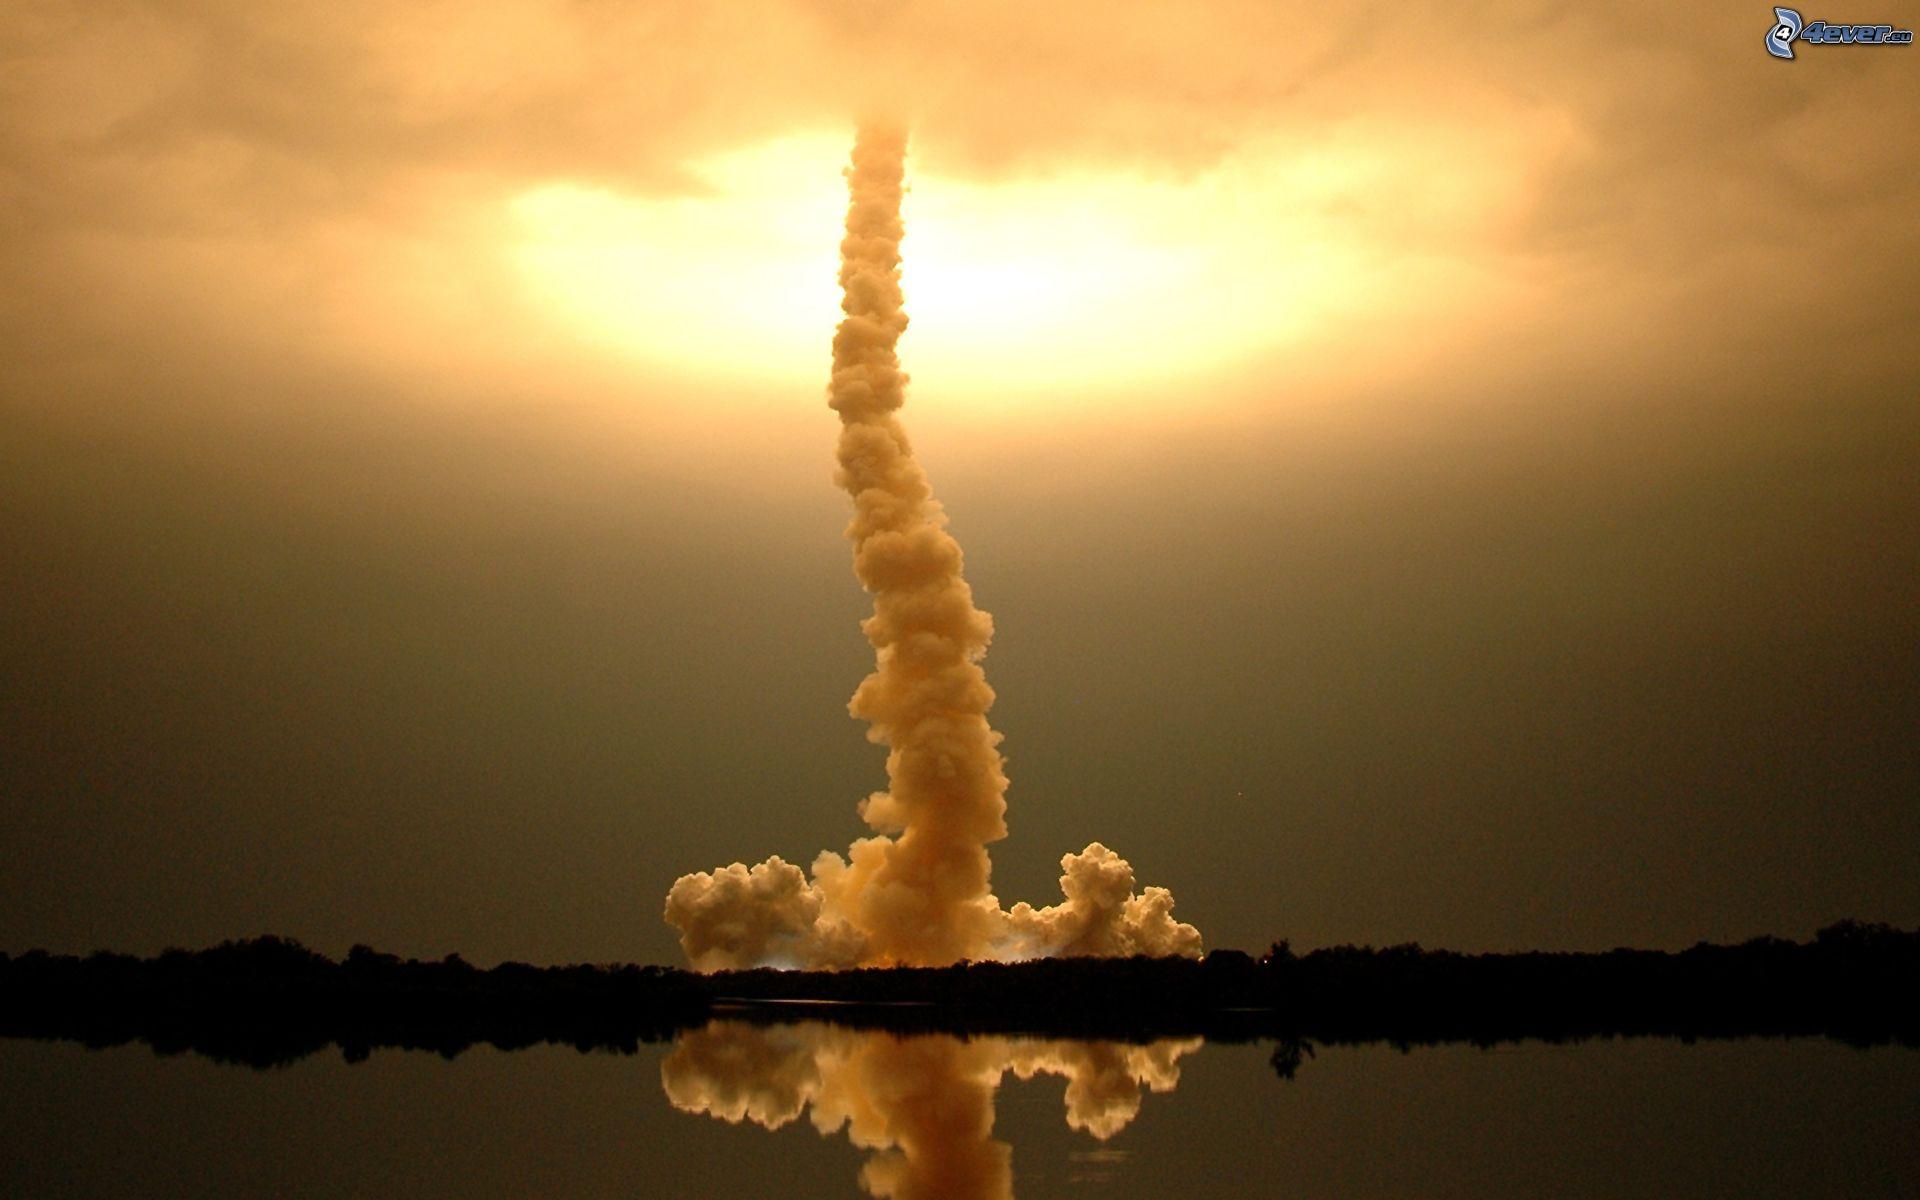 nächster space shuttle start - photo #13